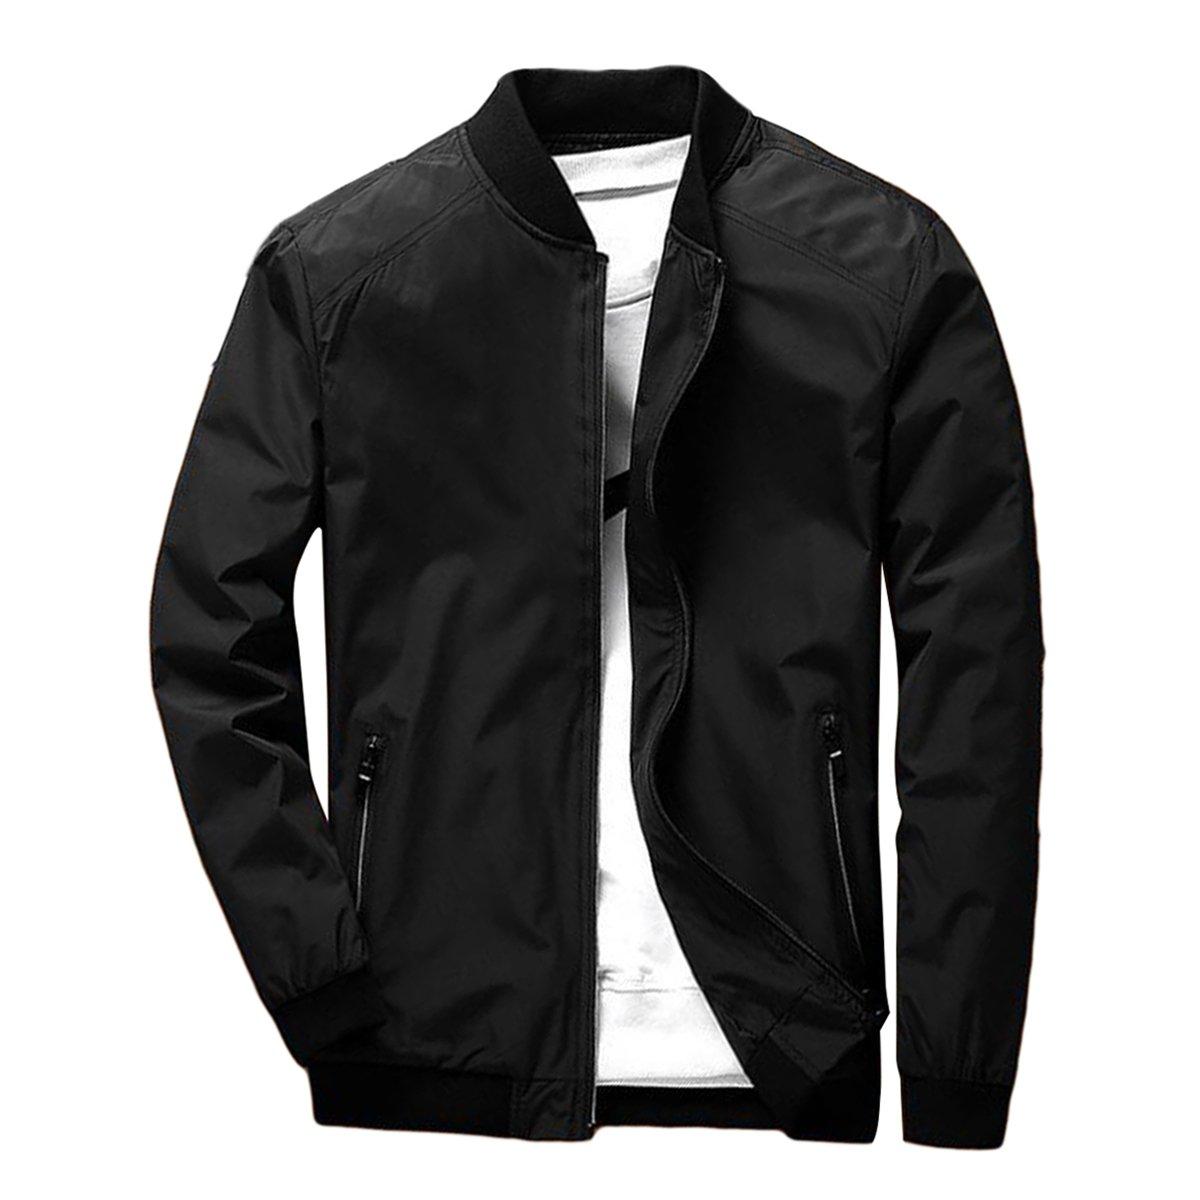 PrettyChic Men's Bomber Jacket Casual Light Slim Fit Full Zip Bike Outerwear Windbreaker, Black, Tag Size 3XL=US Size L by PrettyChic